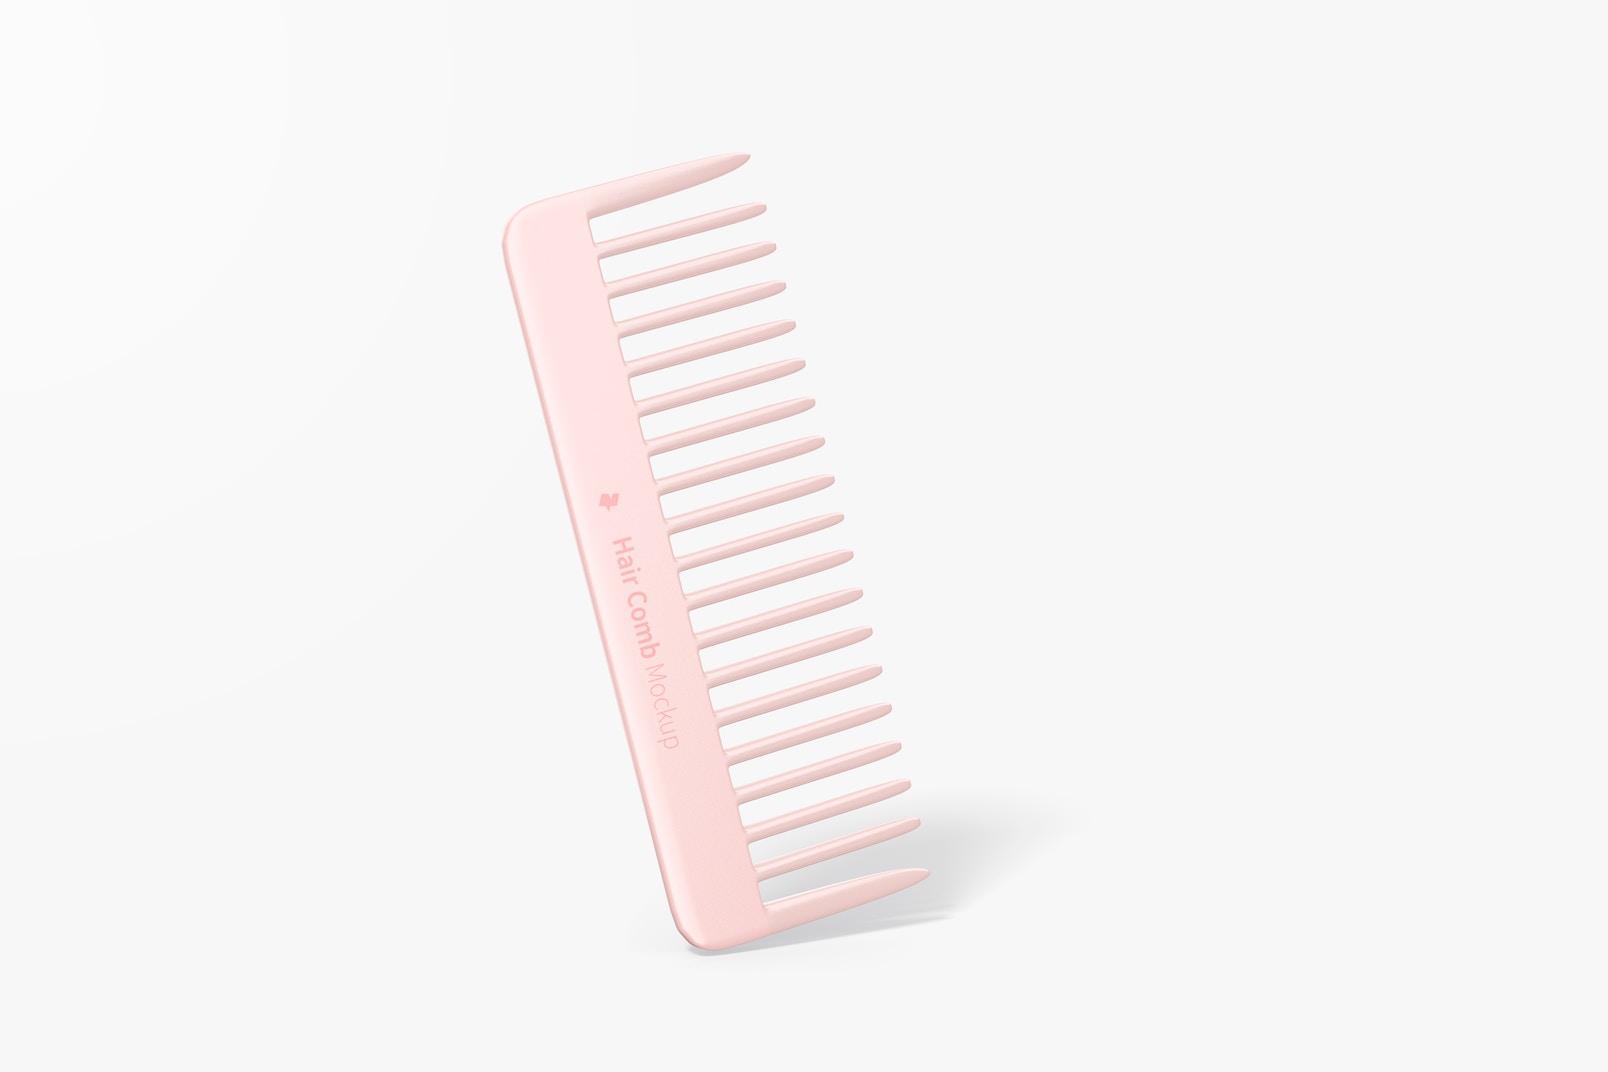 Hair Comb Mockup